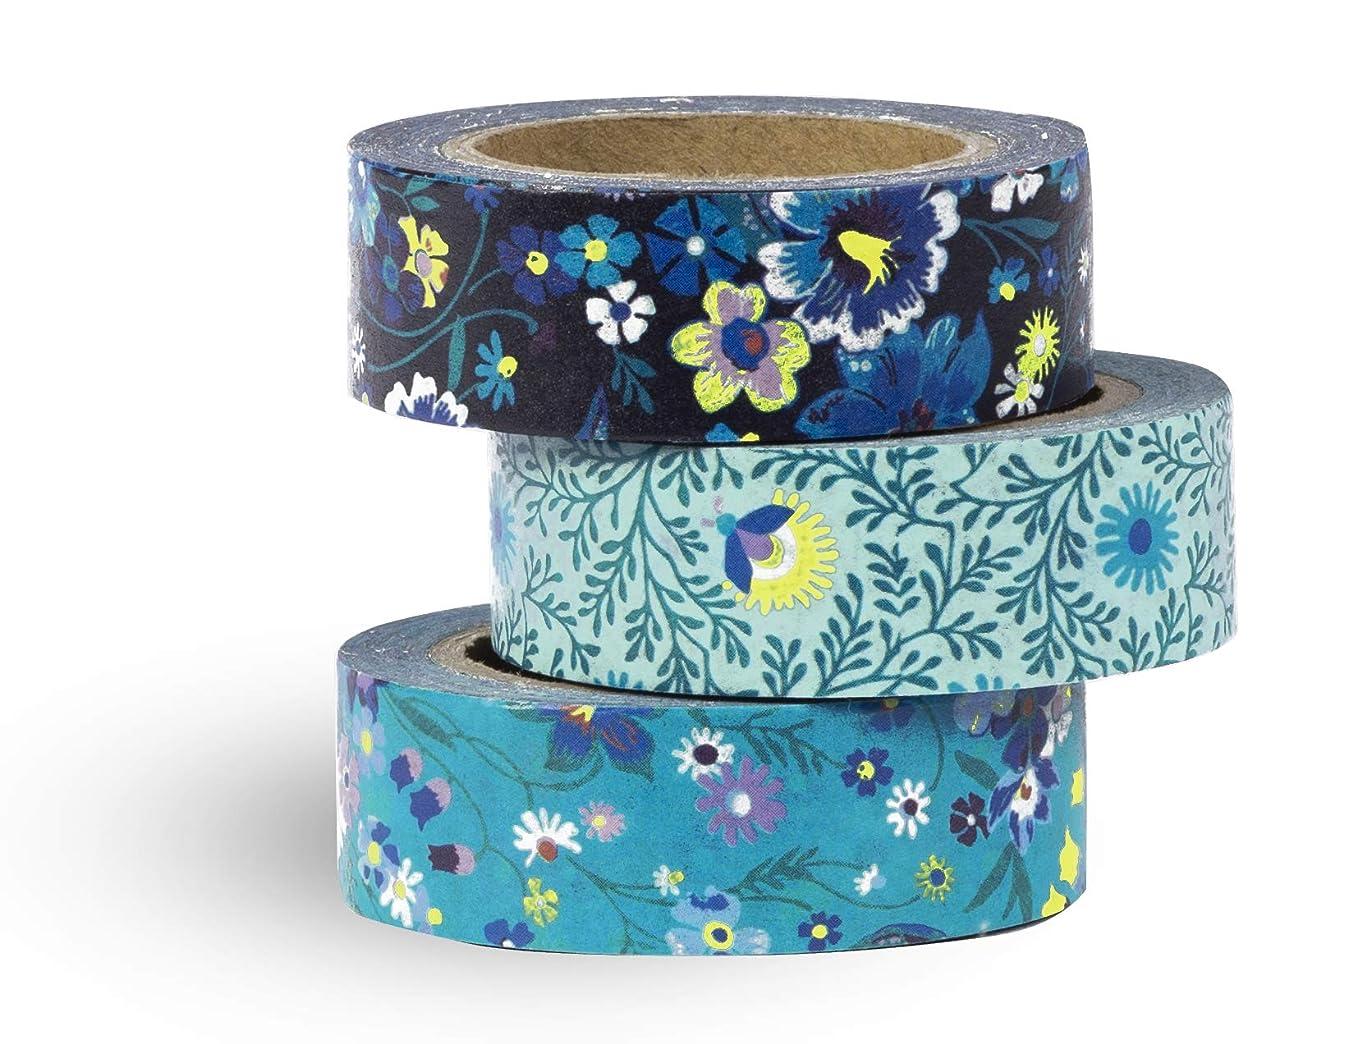 Vera Bradley Decorative Paper Tape Set of 3, Moonlight Garden